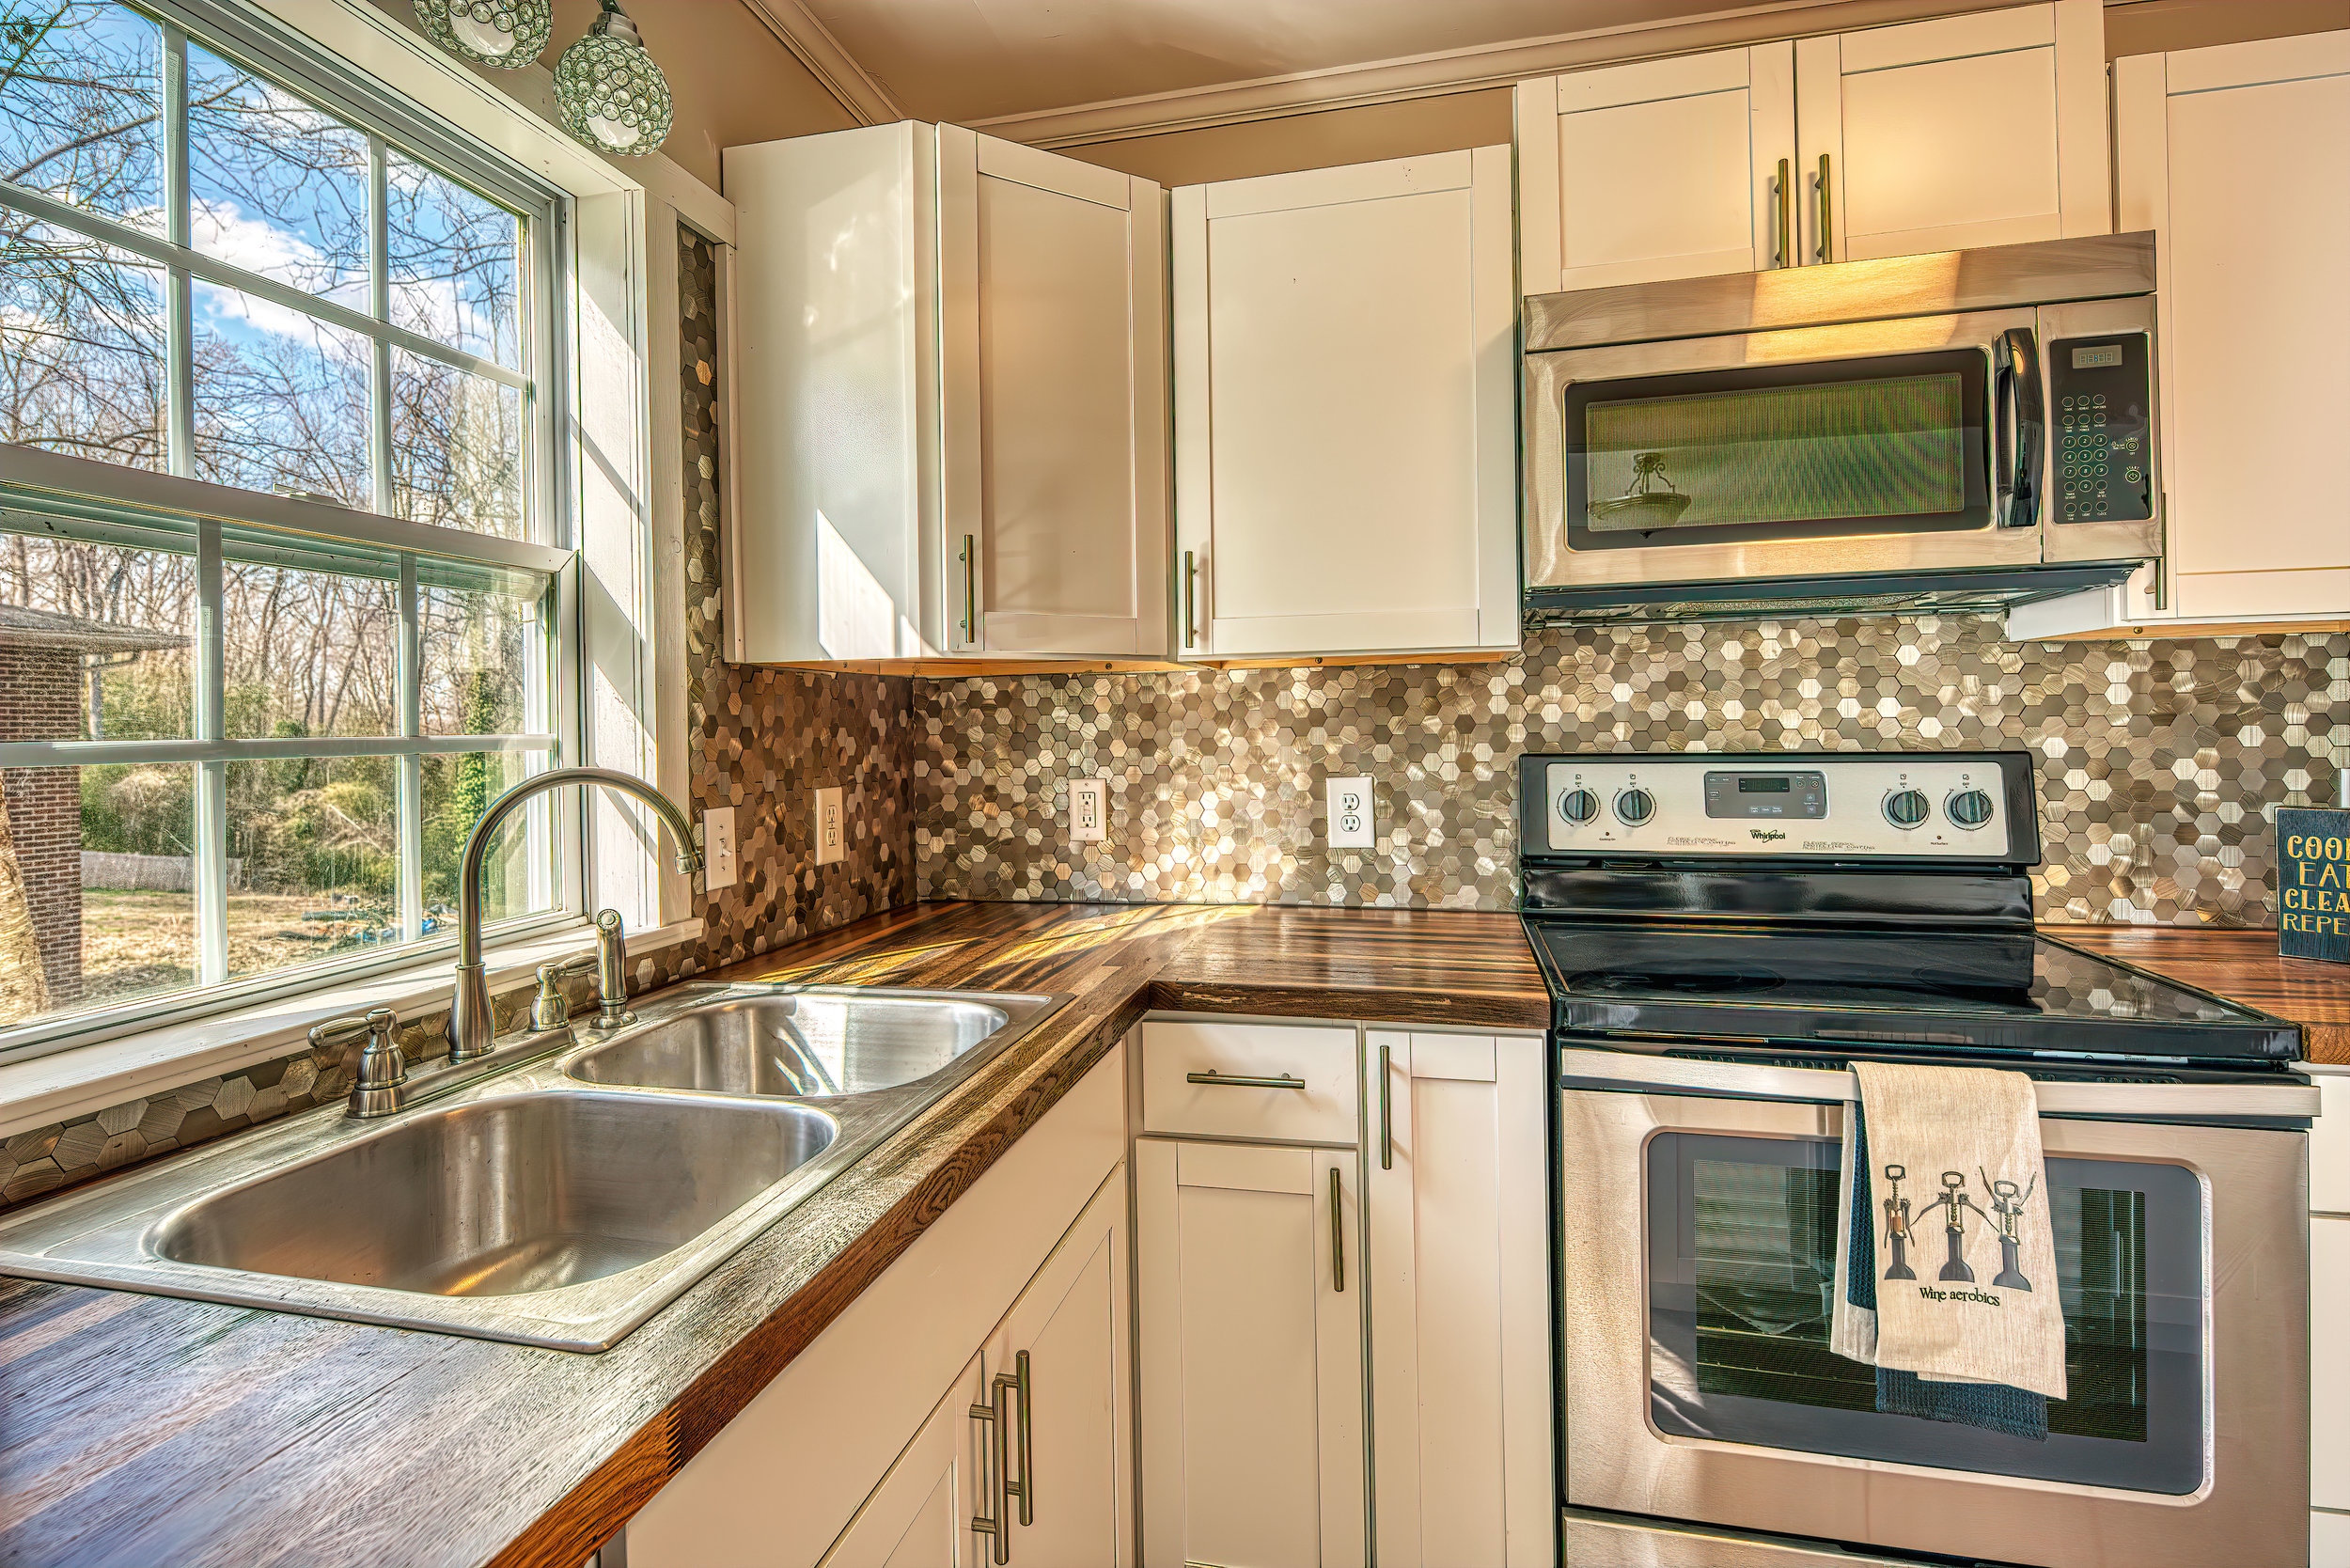 8 Kitchen Counters.jpg